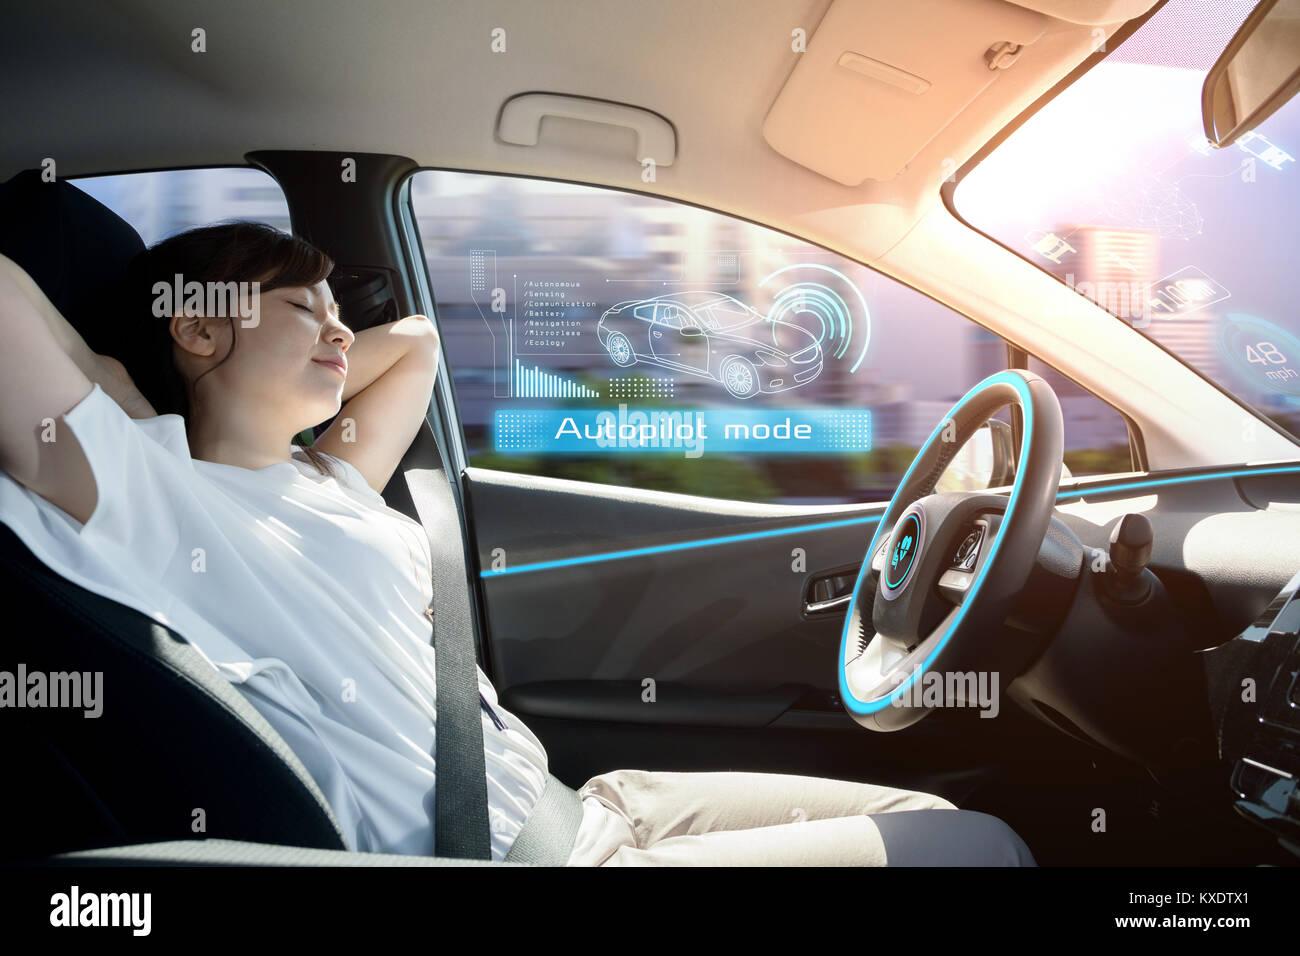 relaxed woman in autonomous car. self driving vehicle. autopilot. automotive technology. - Stock Image